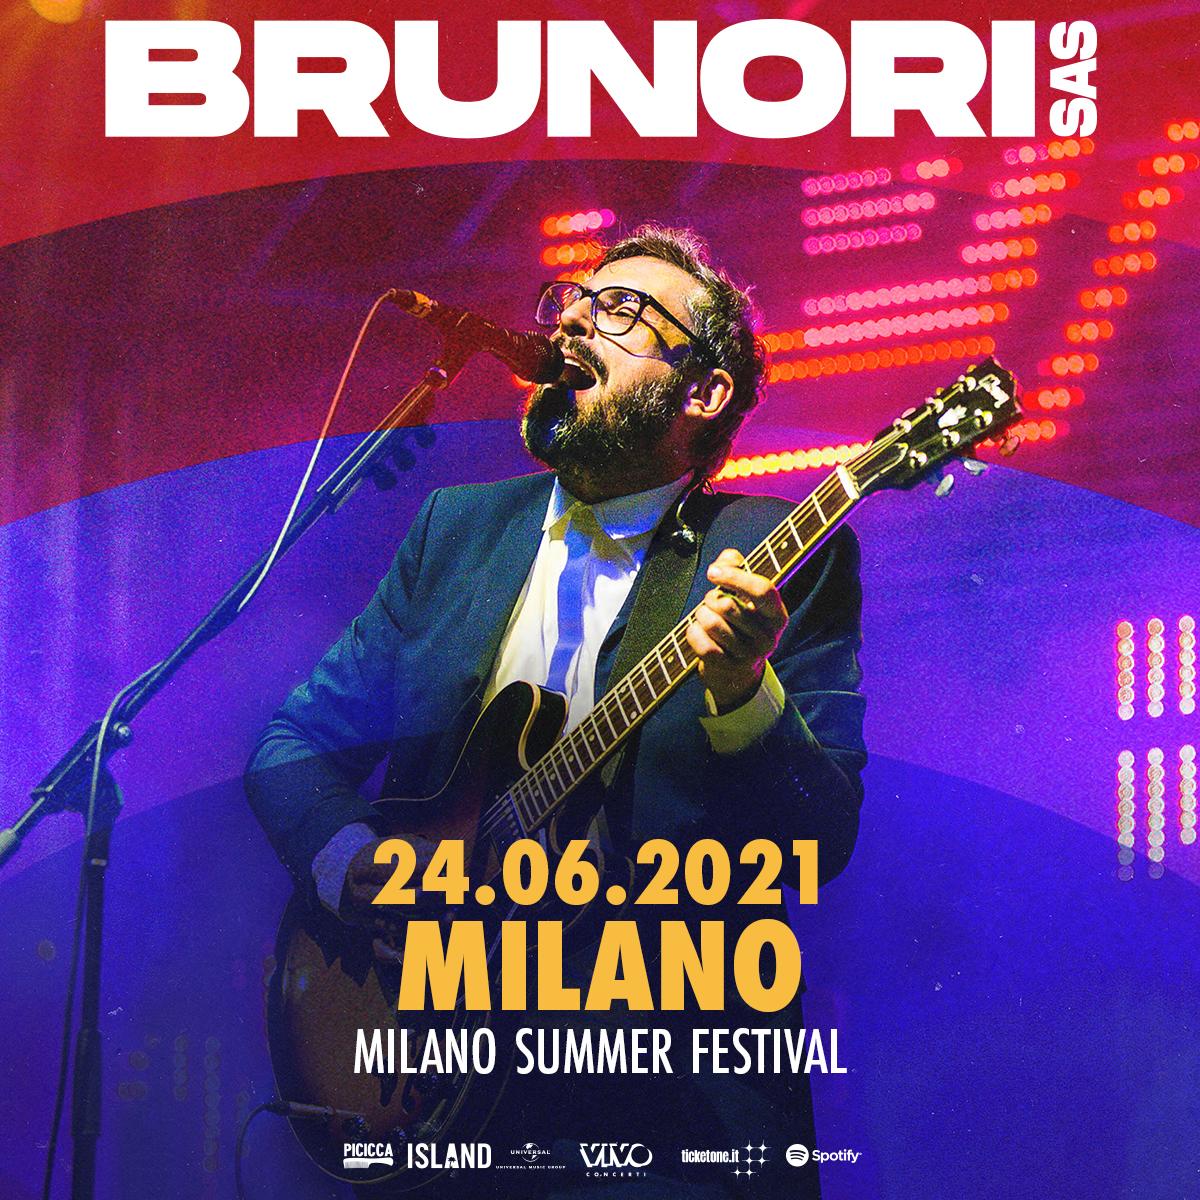 Brunori Sas 24 Giugno 2021